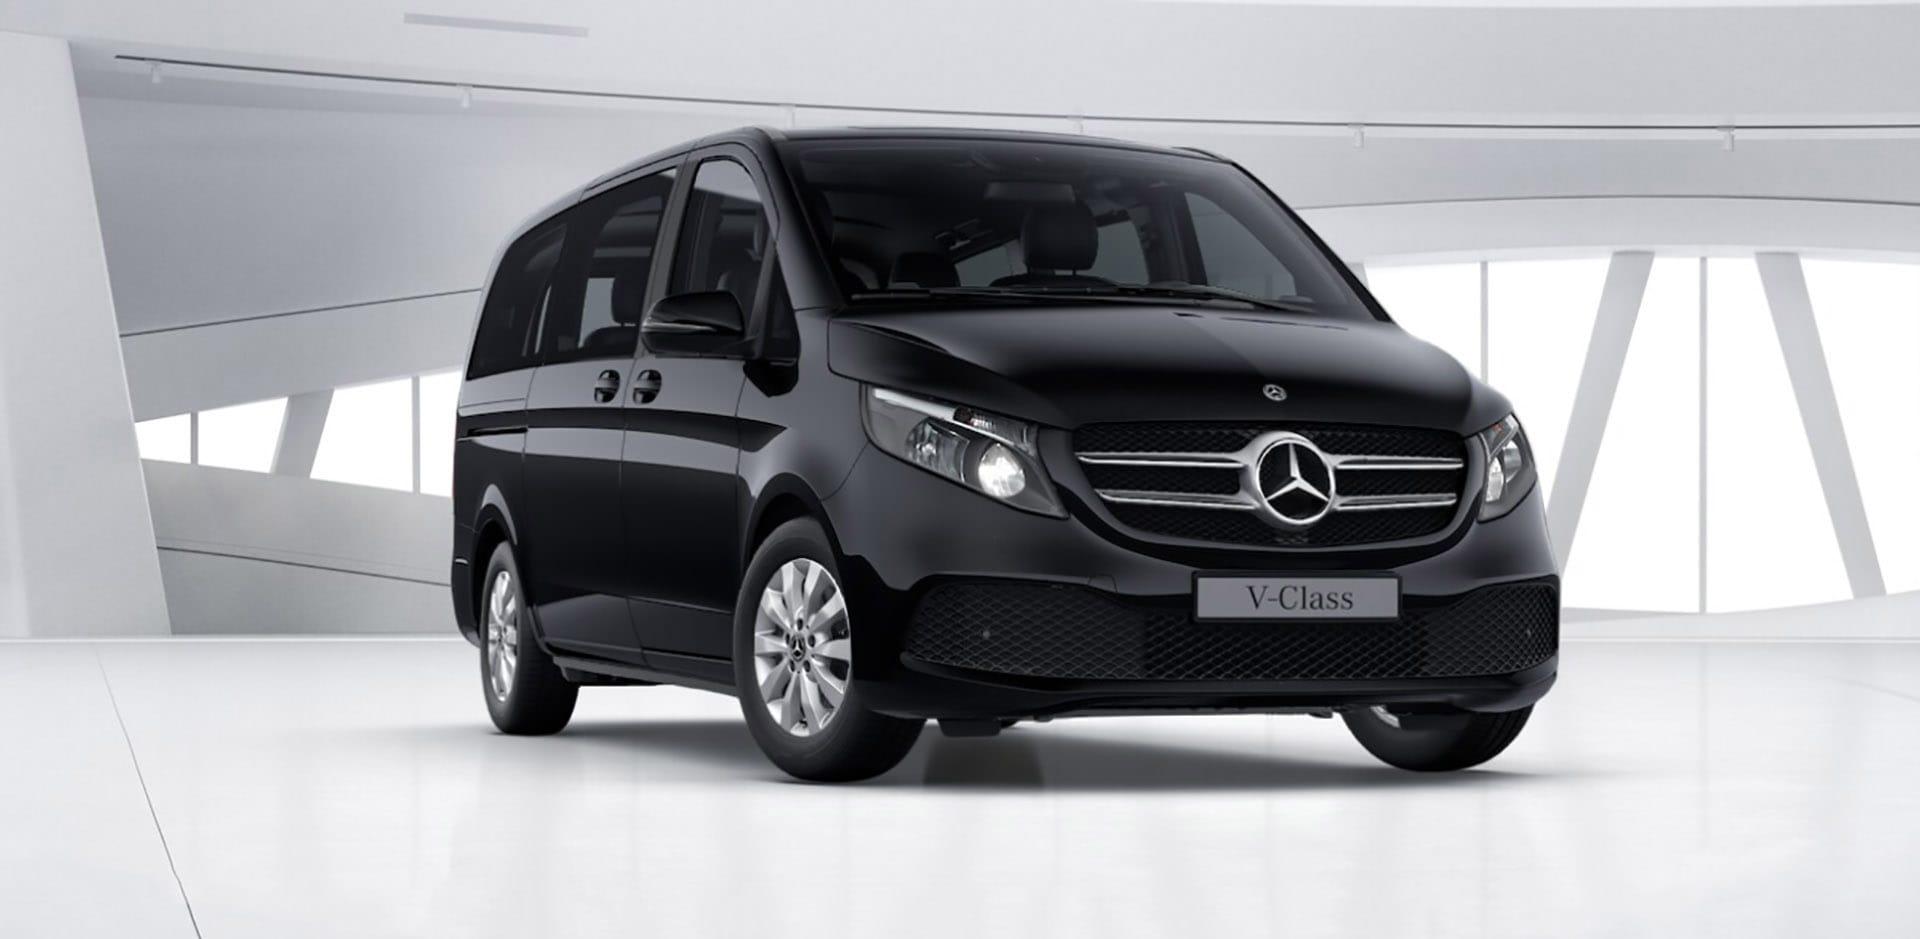 Mercedes-Benz V-Class 5152600050